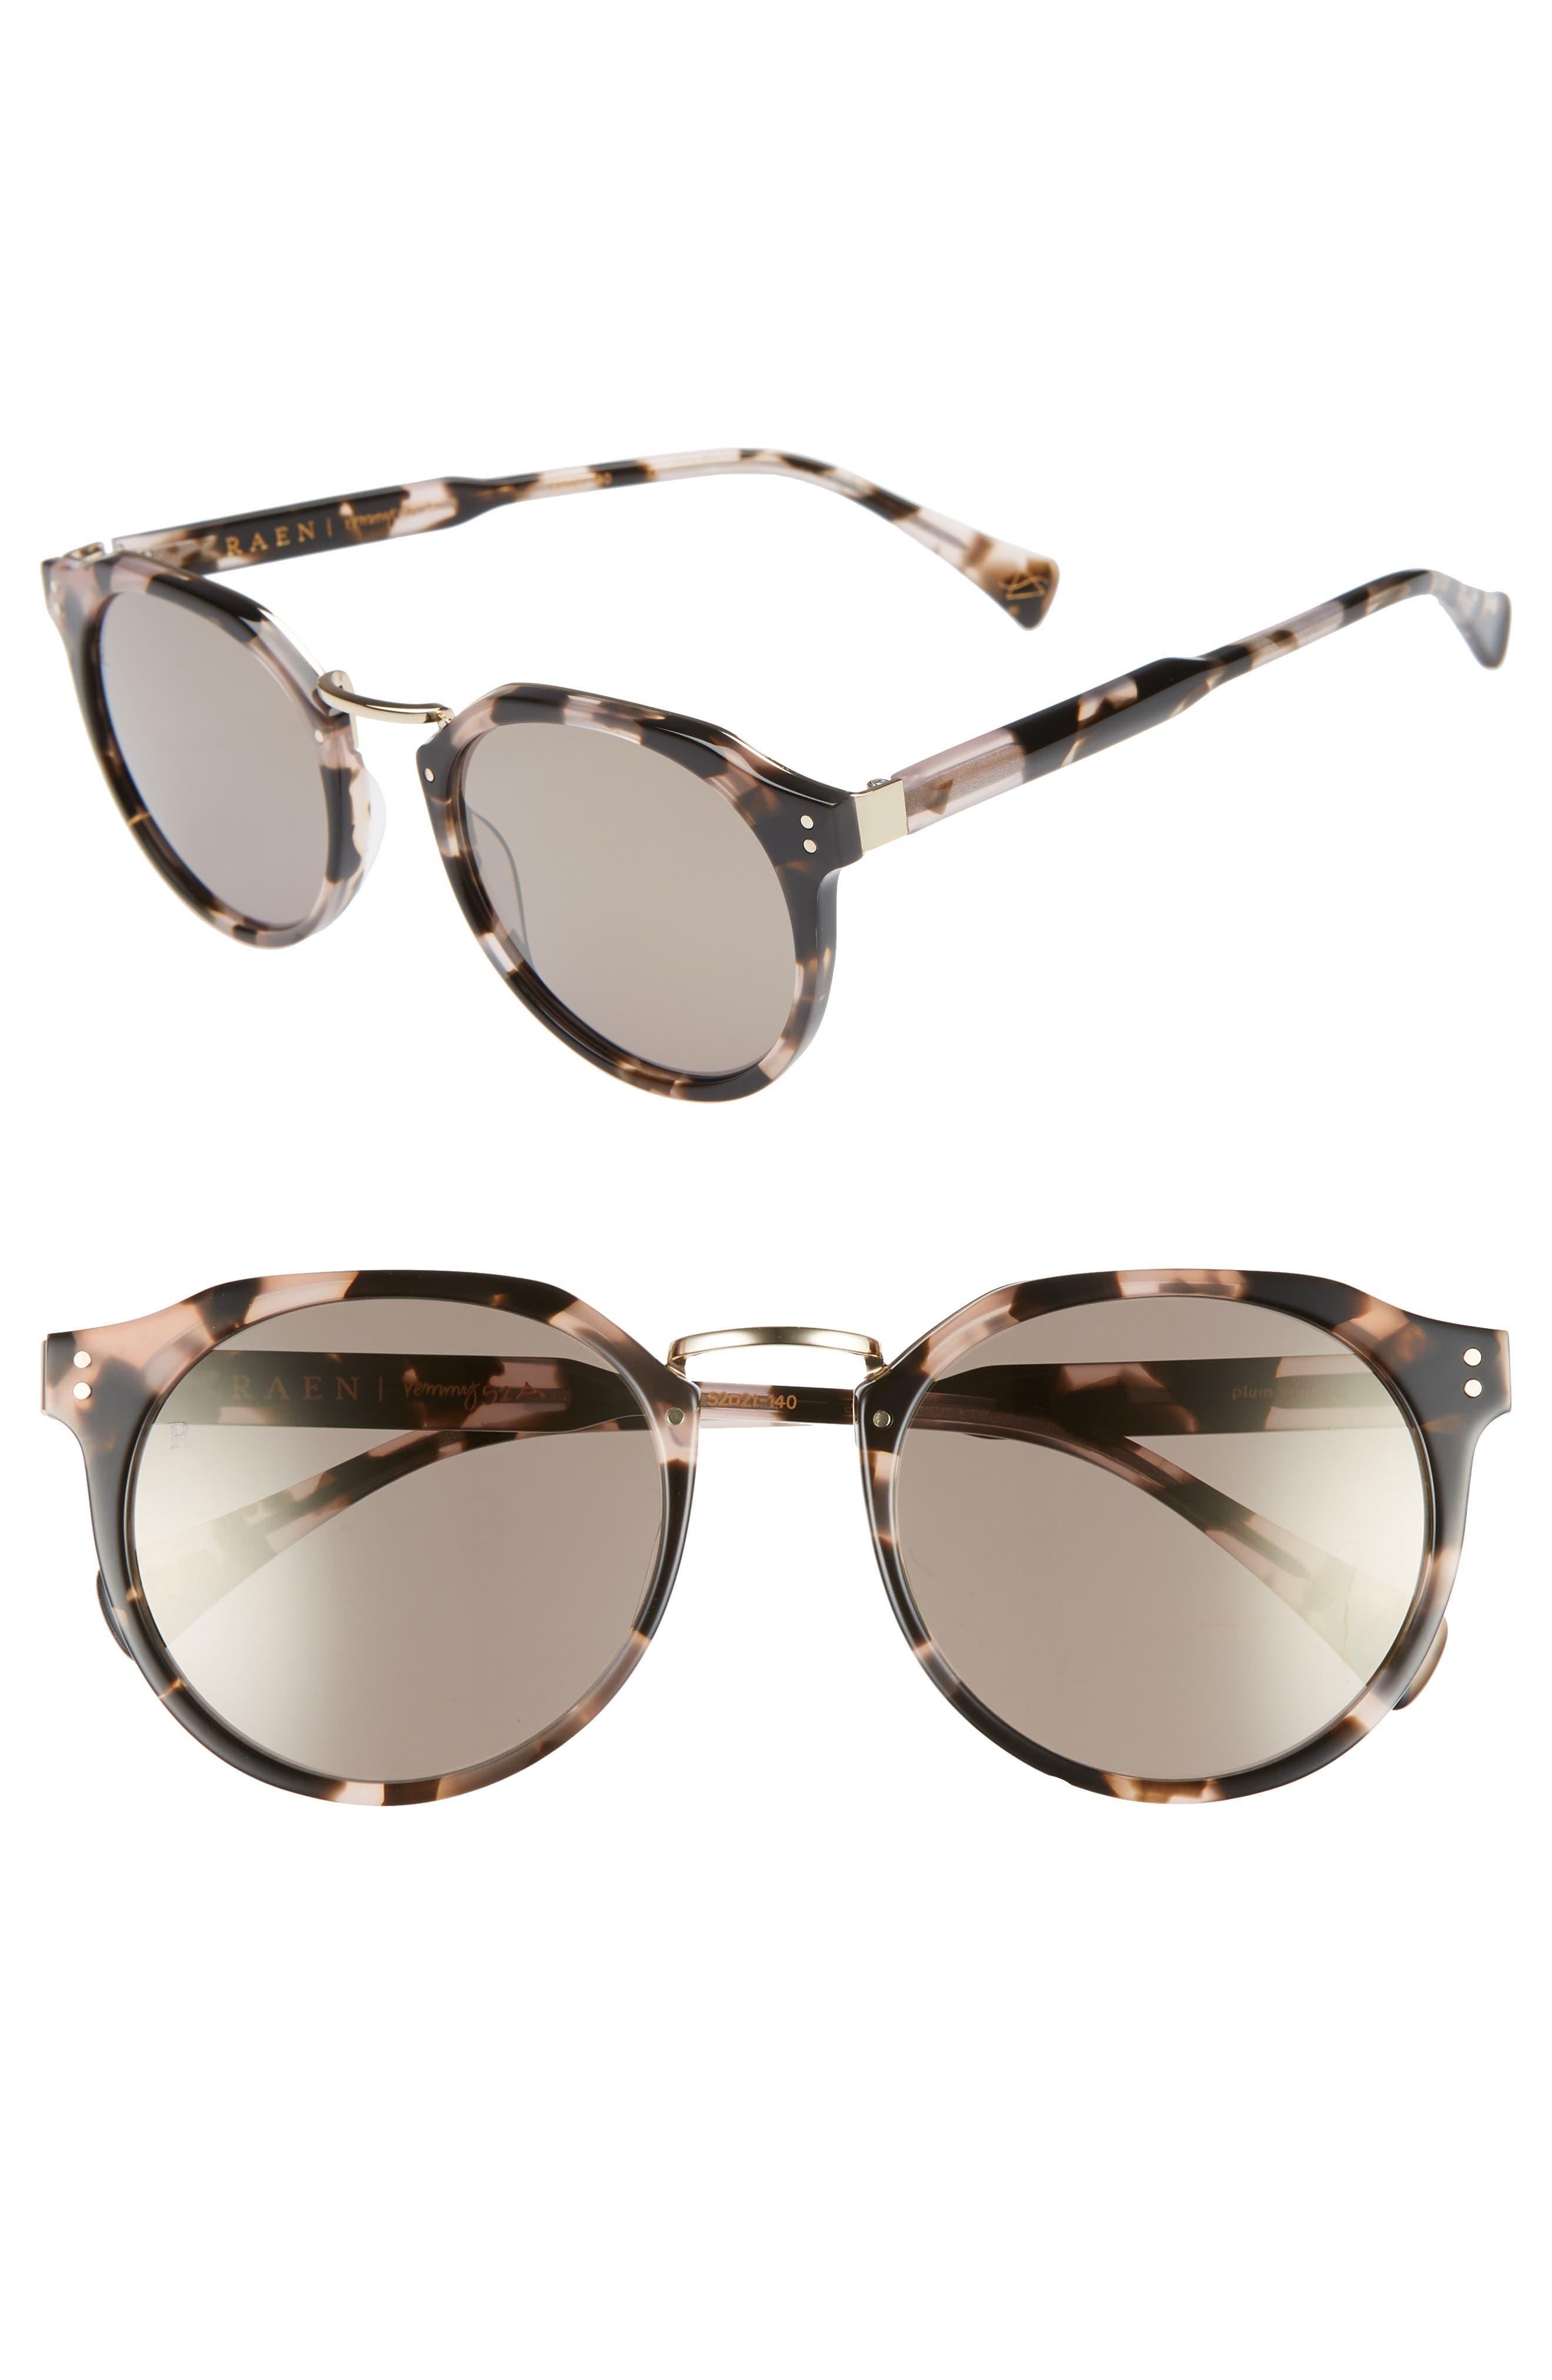 Remmy 52mm Sunglasses,                             Main thumbnail 1, color,                             PLUM WINE